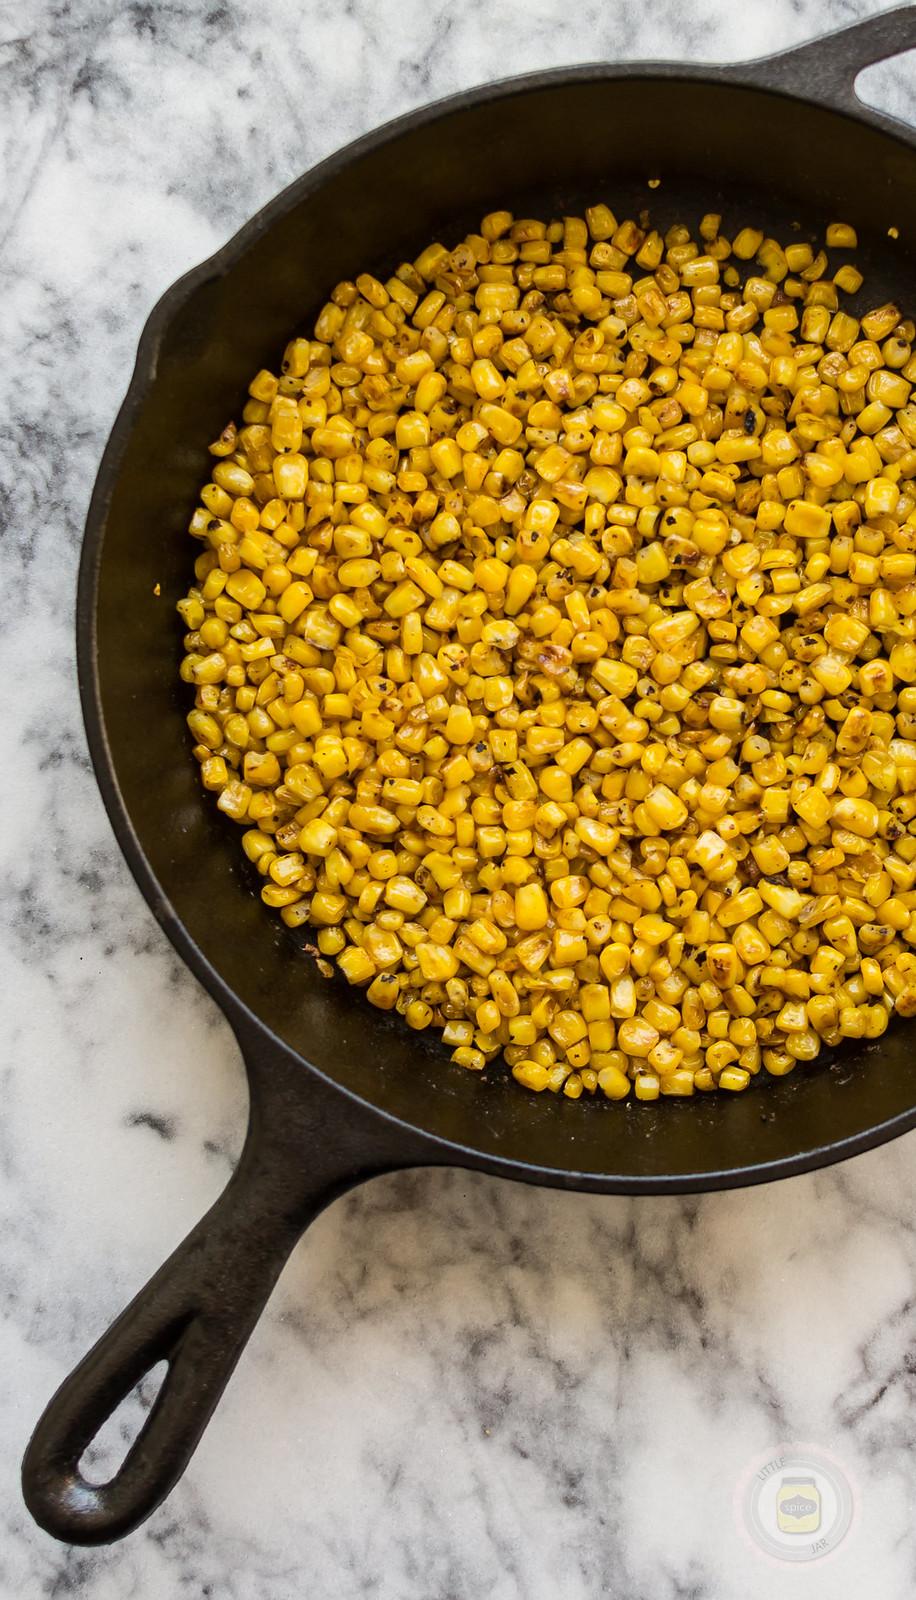 Southwestern Black Bean and Roasted Corn Salad (RC2)